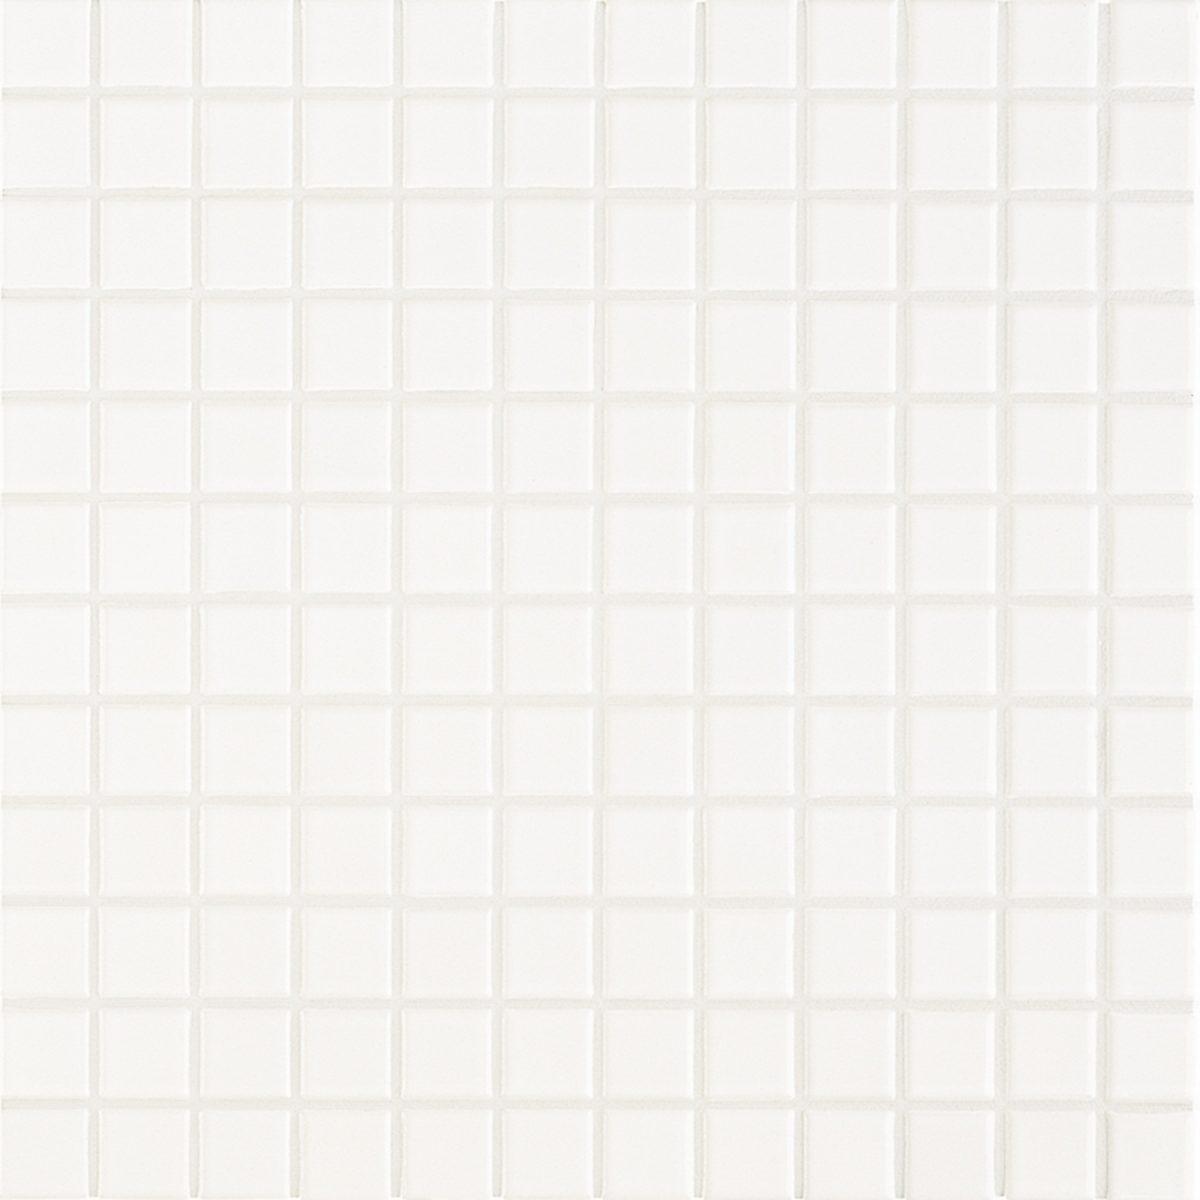 Мозаика серия Fresh 2,4 X 2,4 см Snow White Glossy (глазурованная)